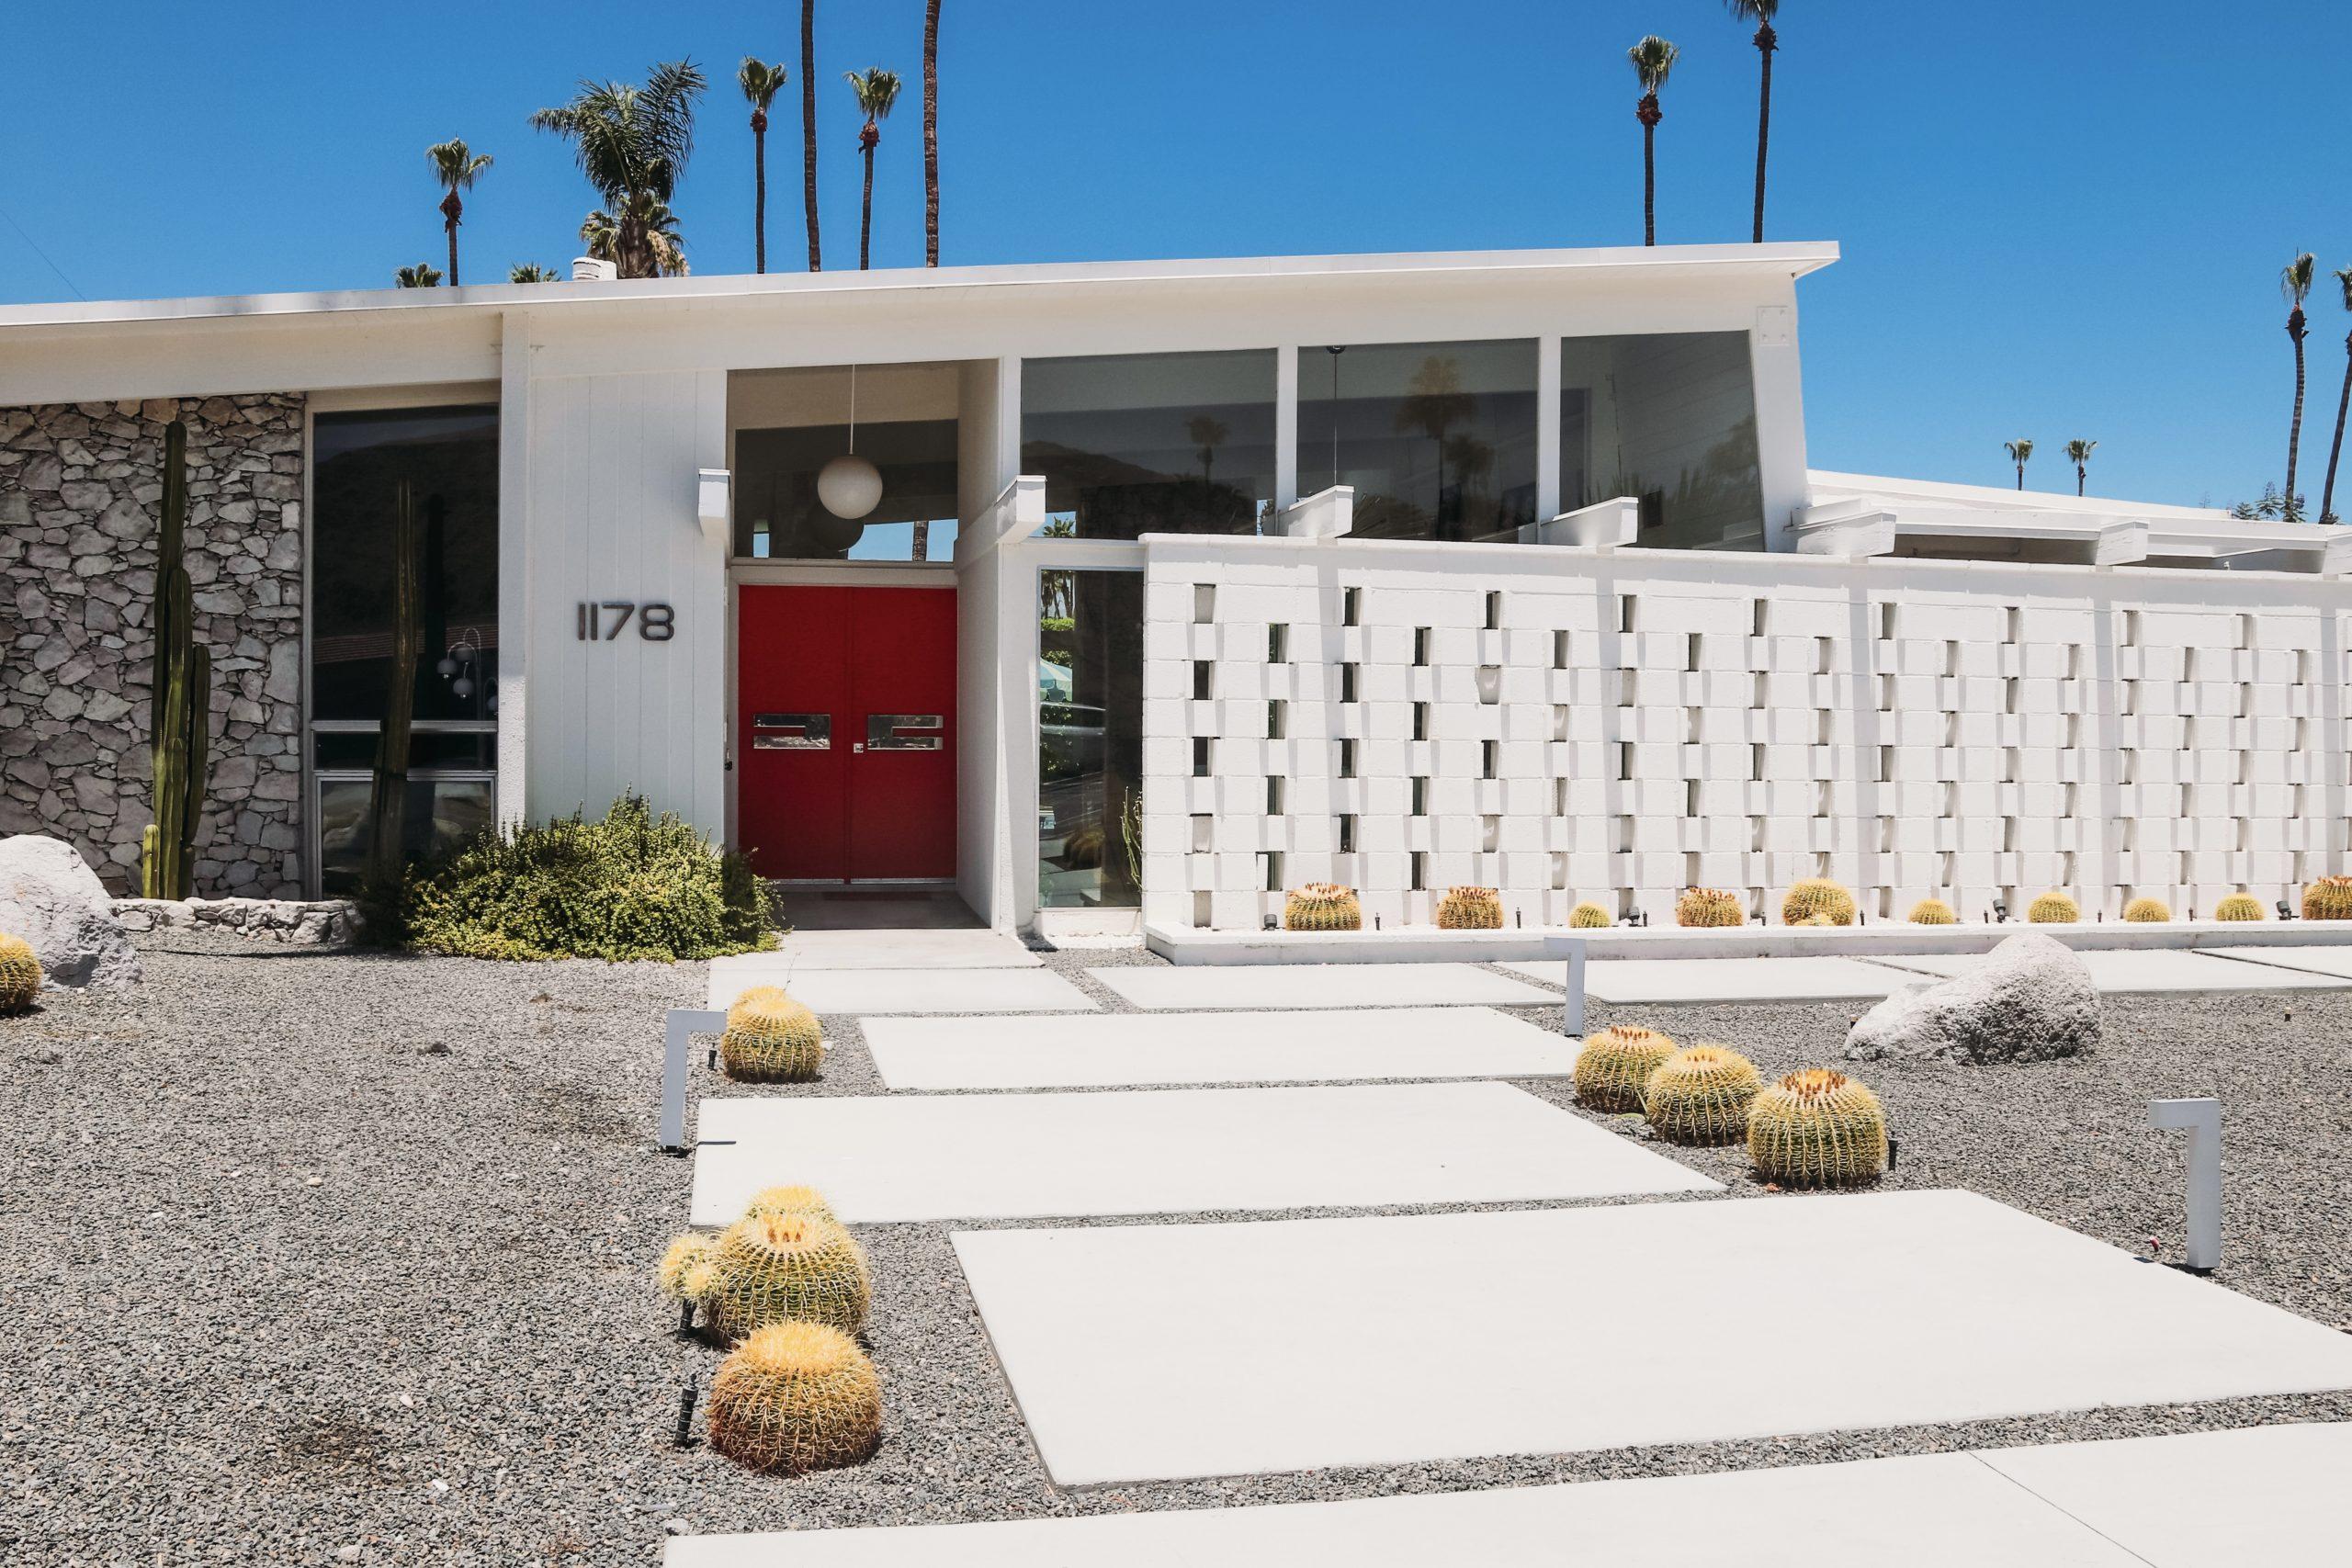 Palms Springs Mid-century modern architecture